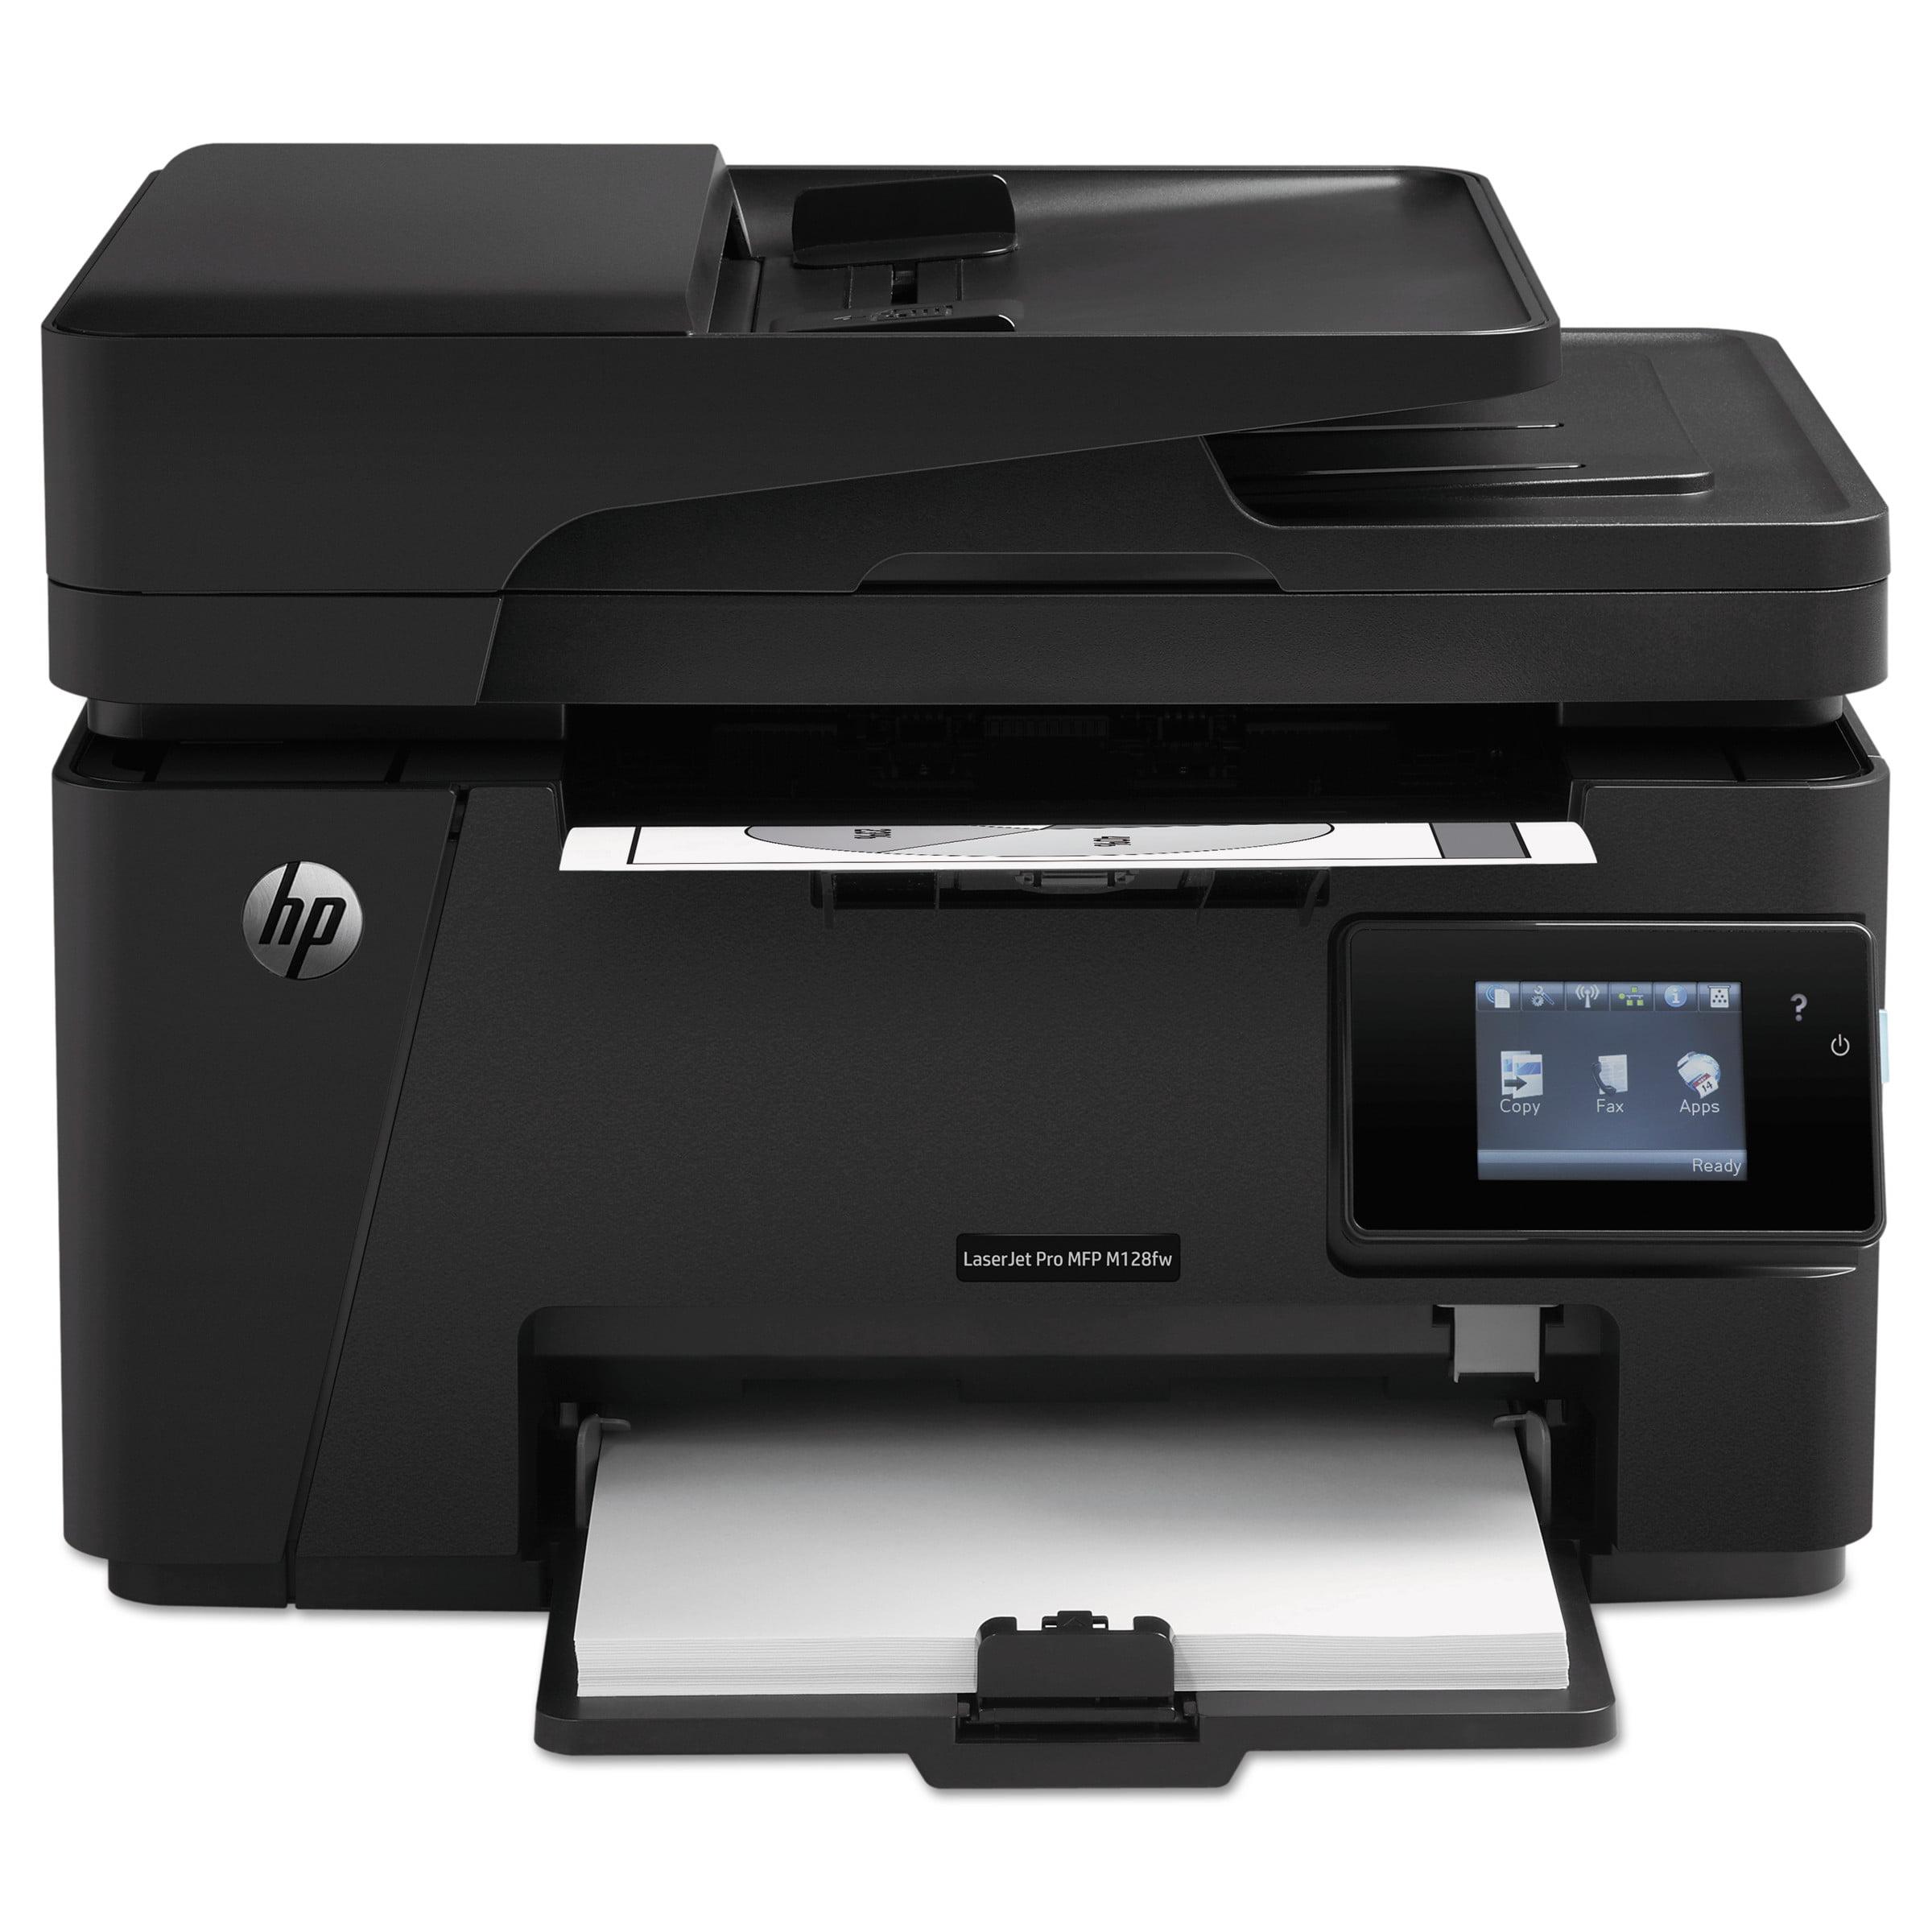 HP LaserJet Pro MFP M127fw Wi-Fi Multifunction Laser Prin...